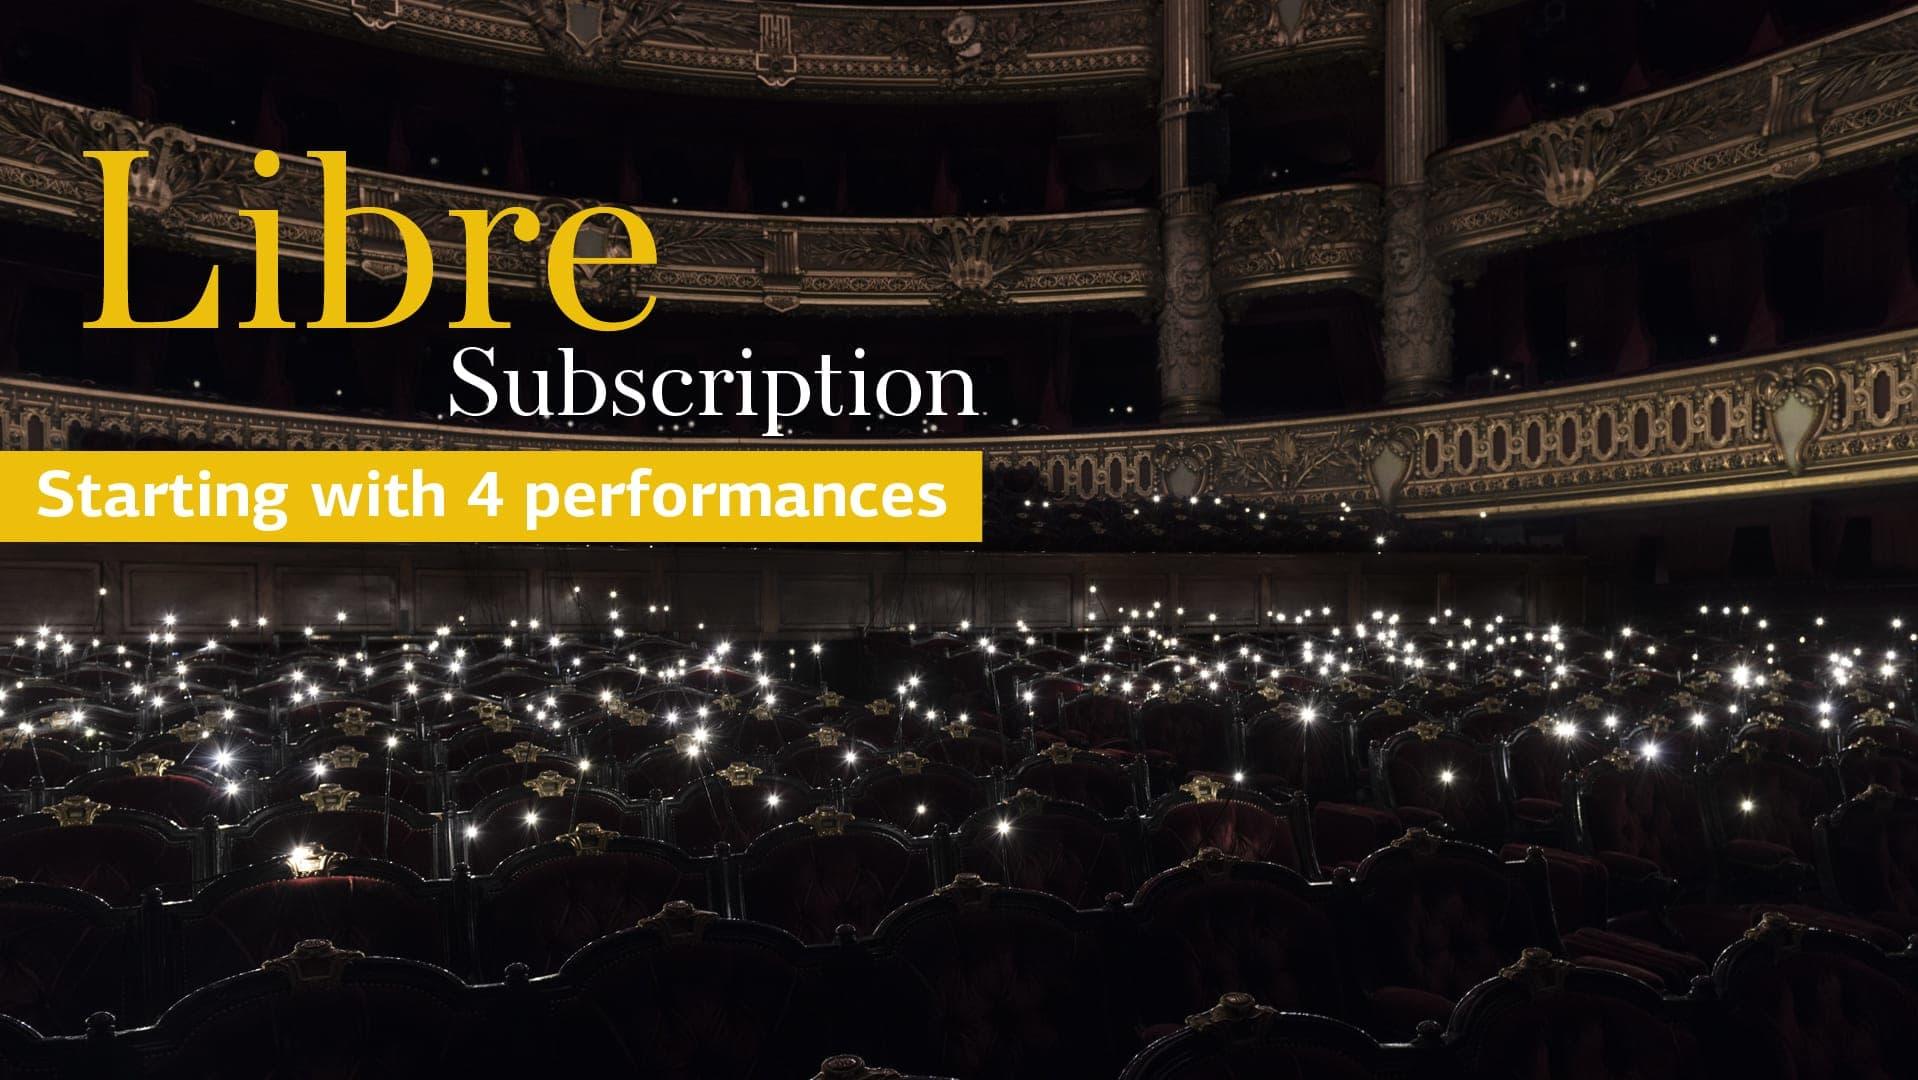 Libre subscription